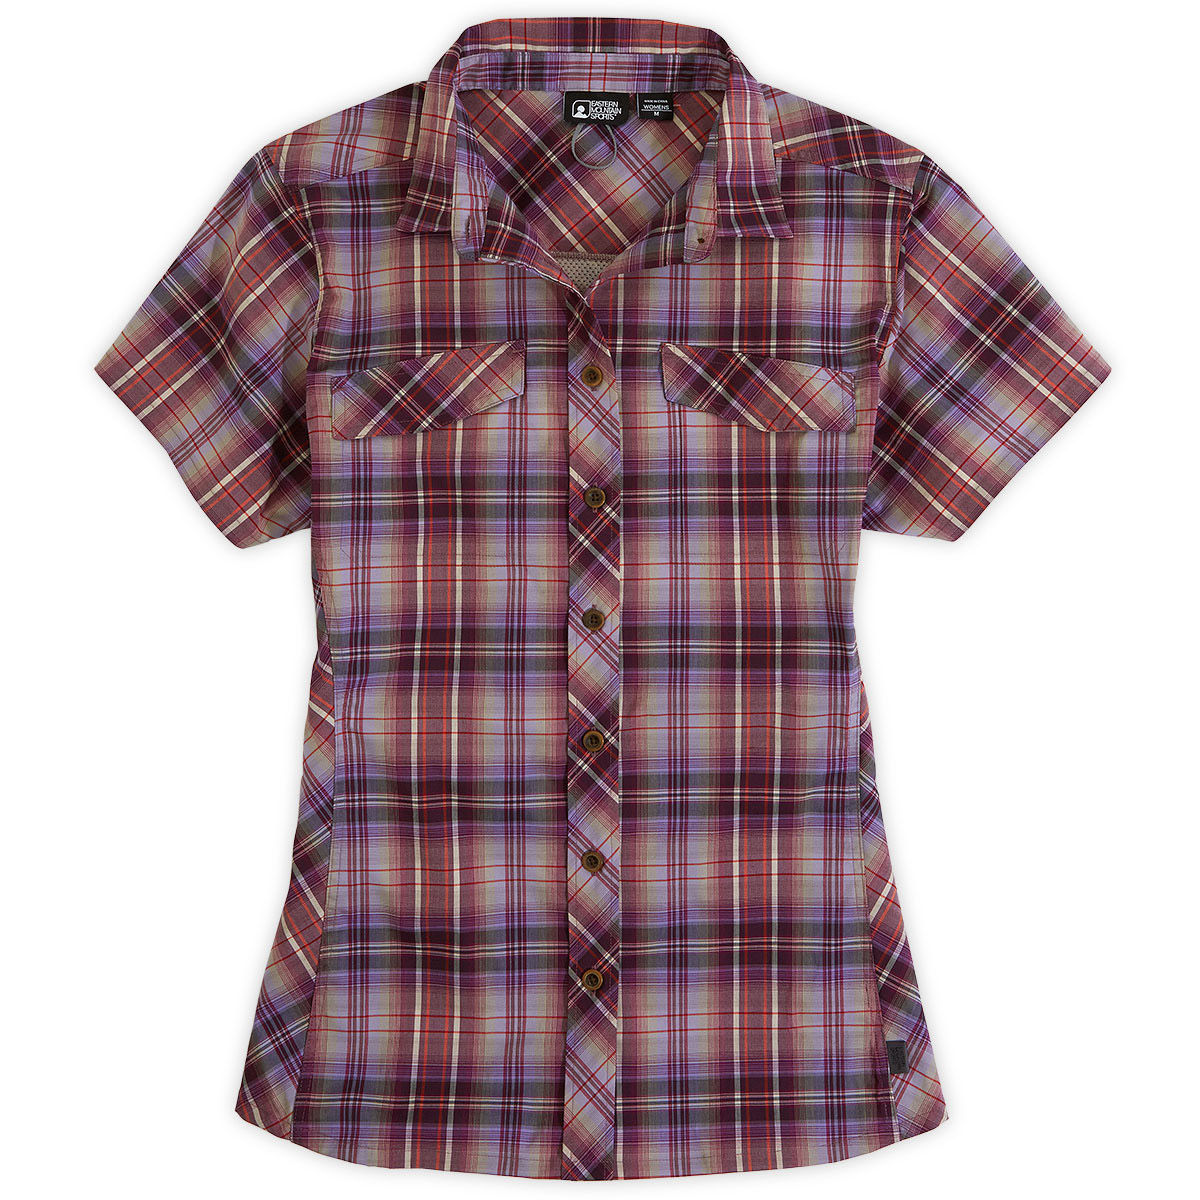 photo: EMS Men's Trailhead Plaid Shirt, S/S hiking shirt